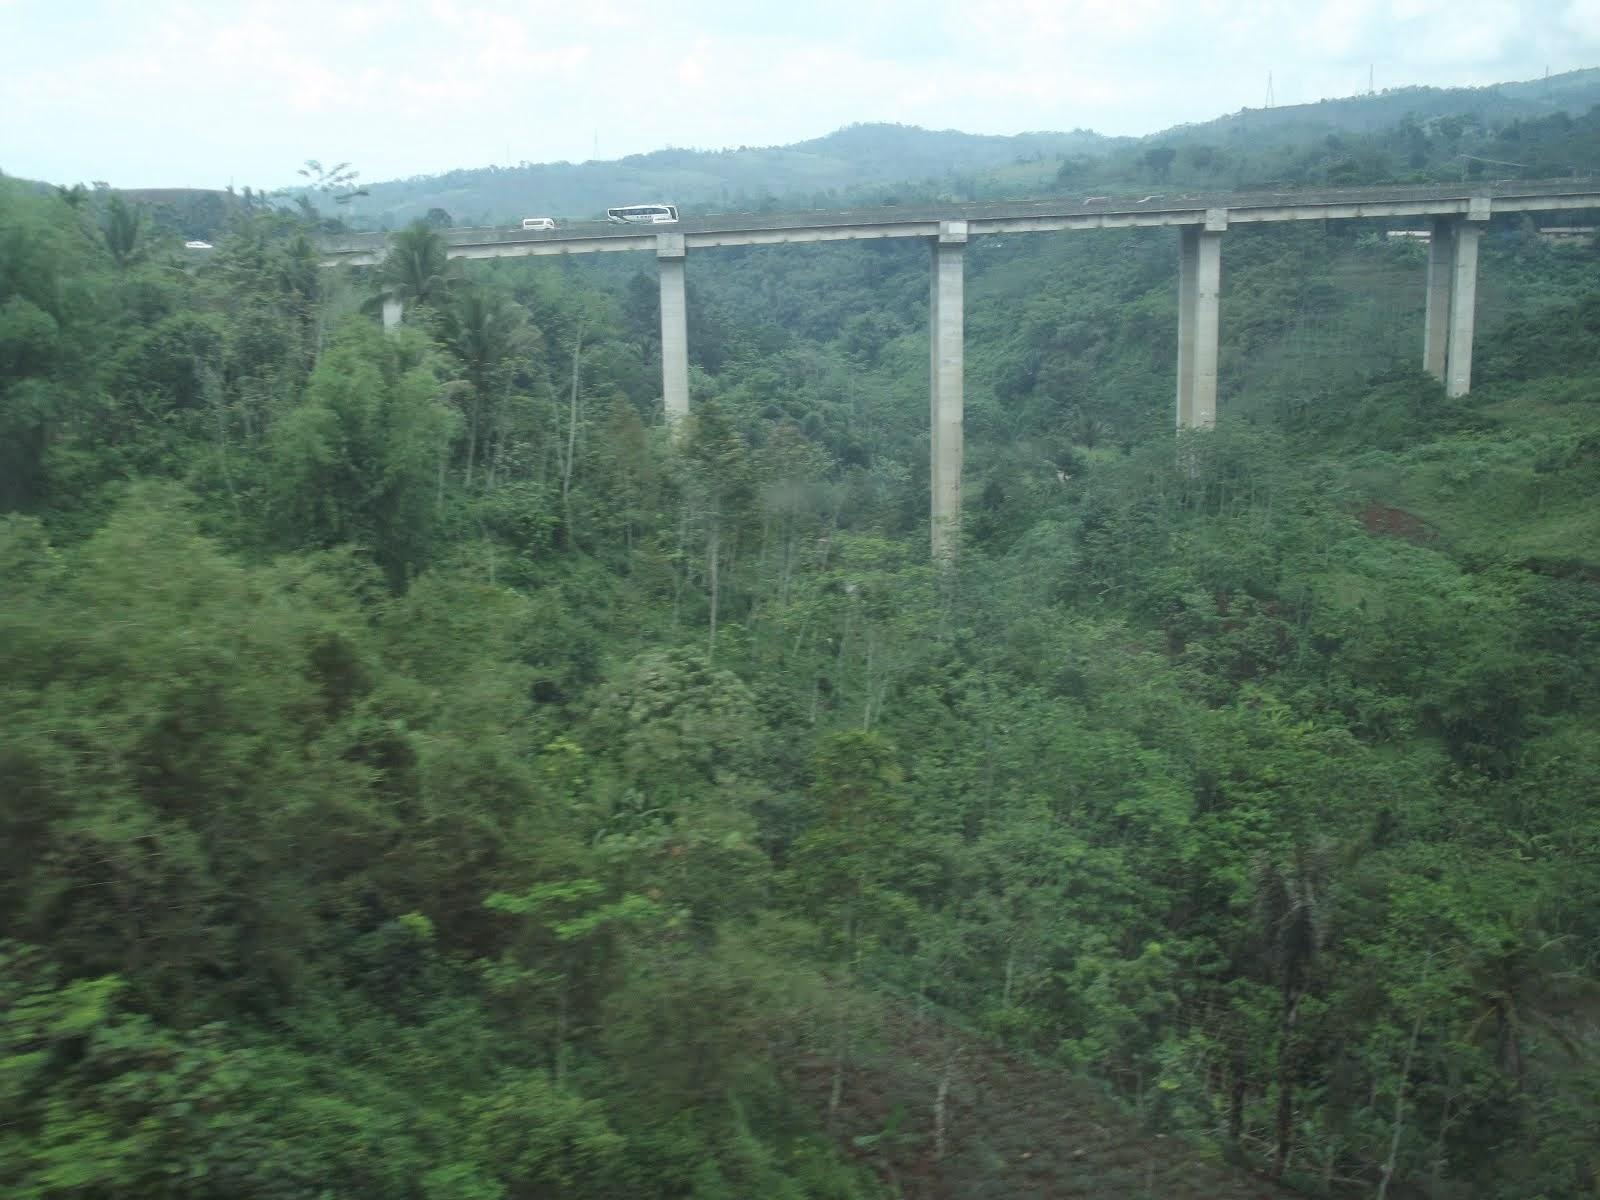 Pemandangan Jalan Raya Memecah Bukit Purwakarta, Jawa Barat, Indonesia